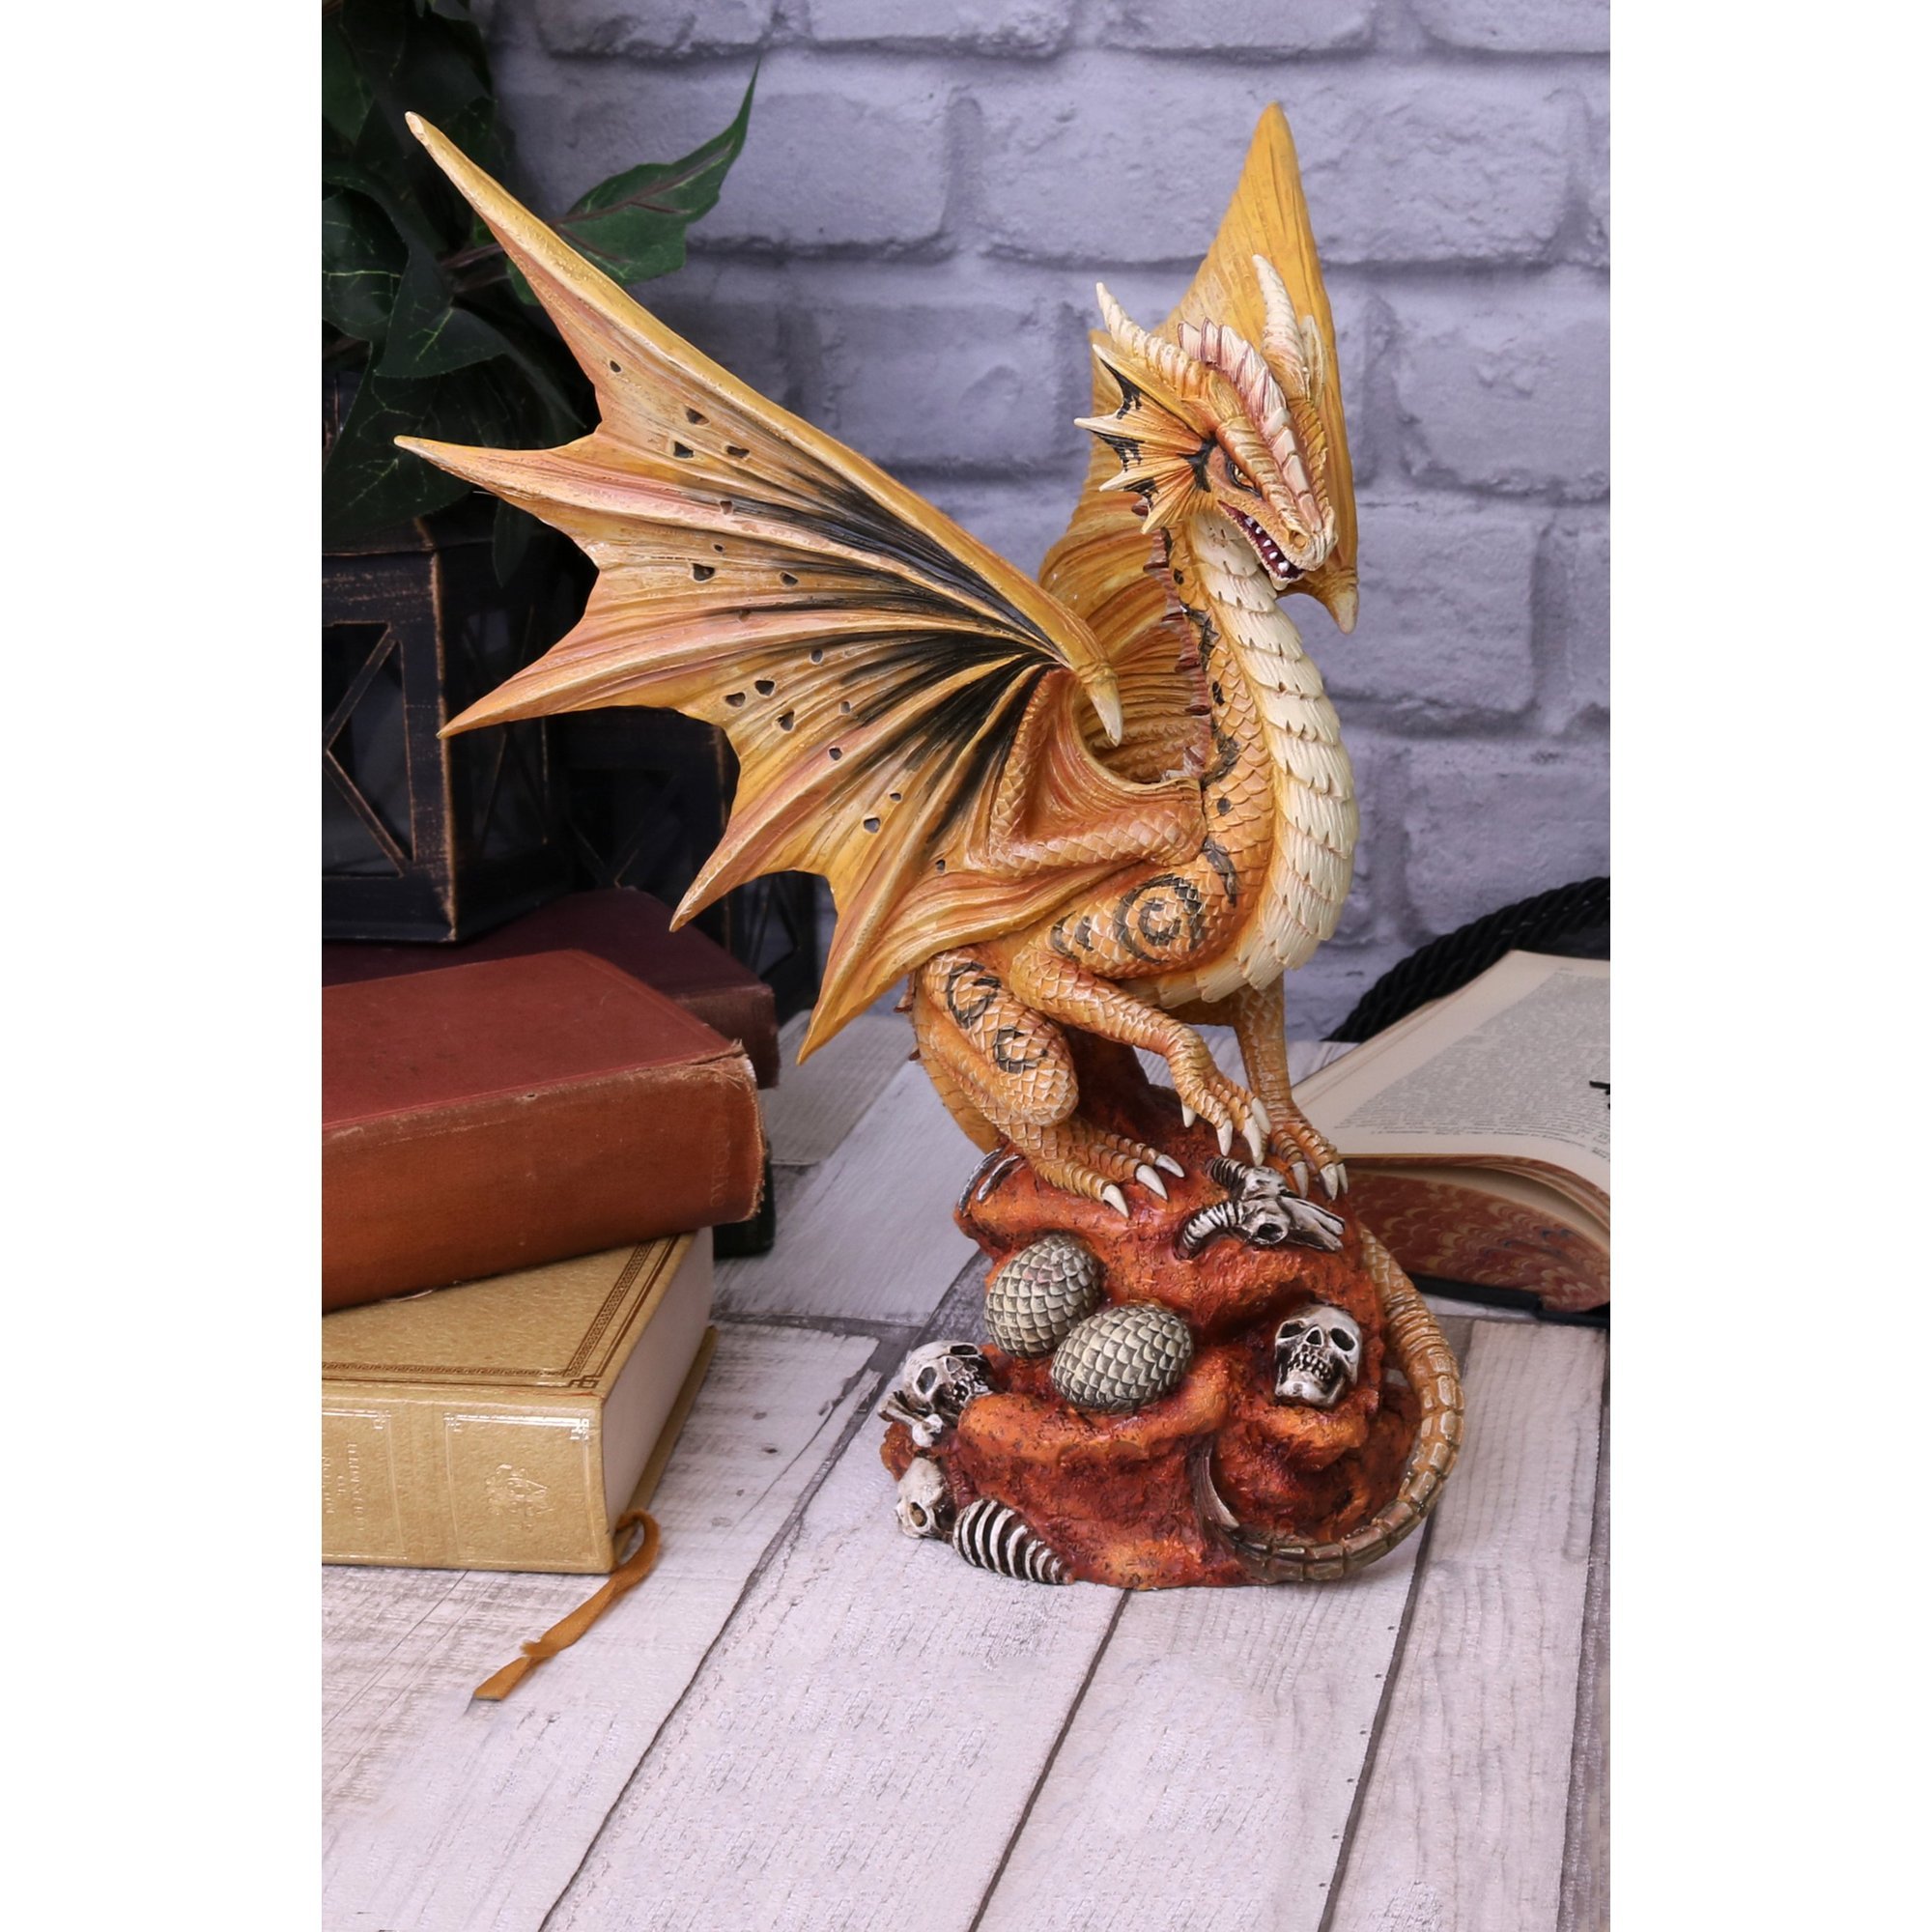 Image of Adult Desert Dragon Figurine